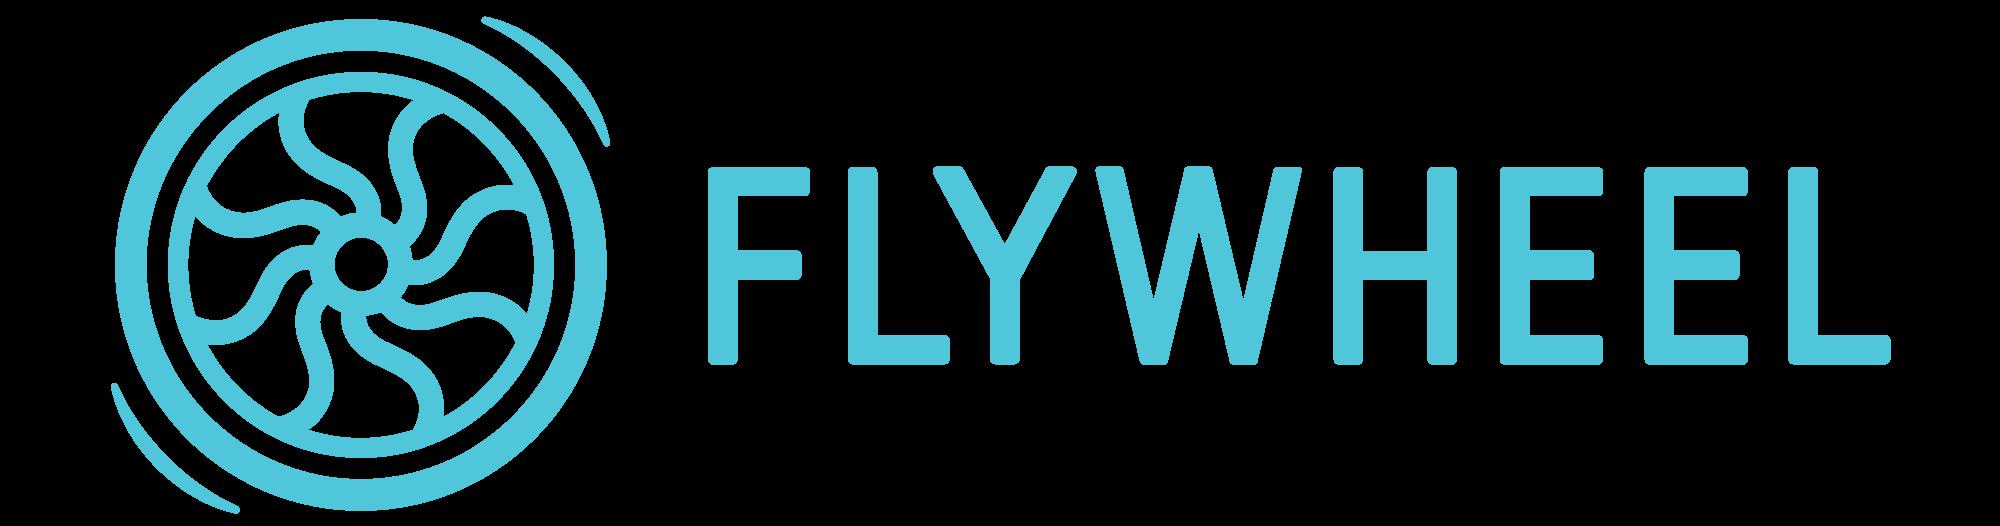 Flywheel Logo WPism deal